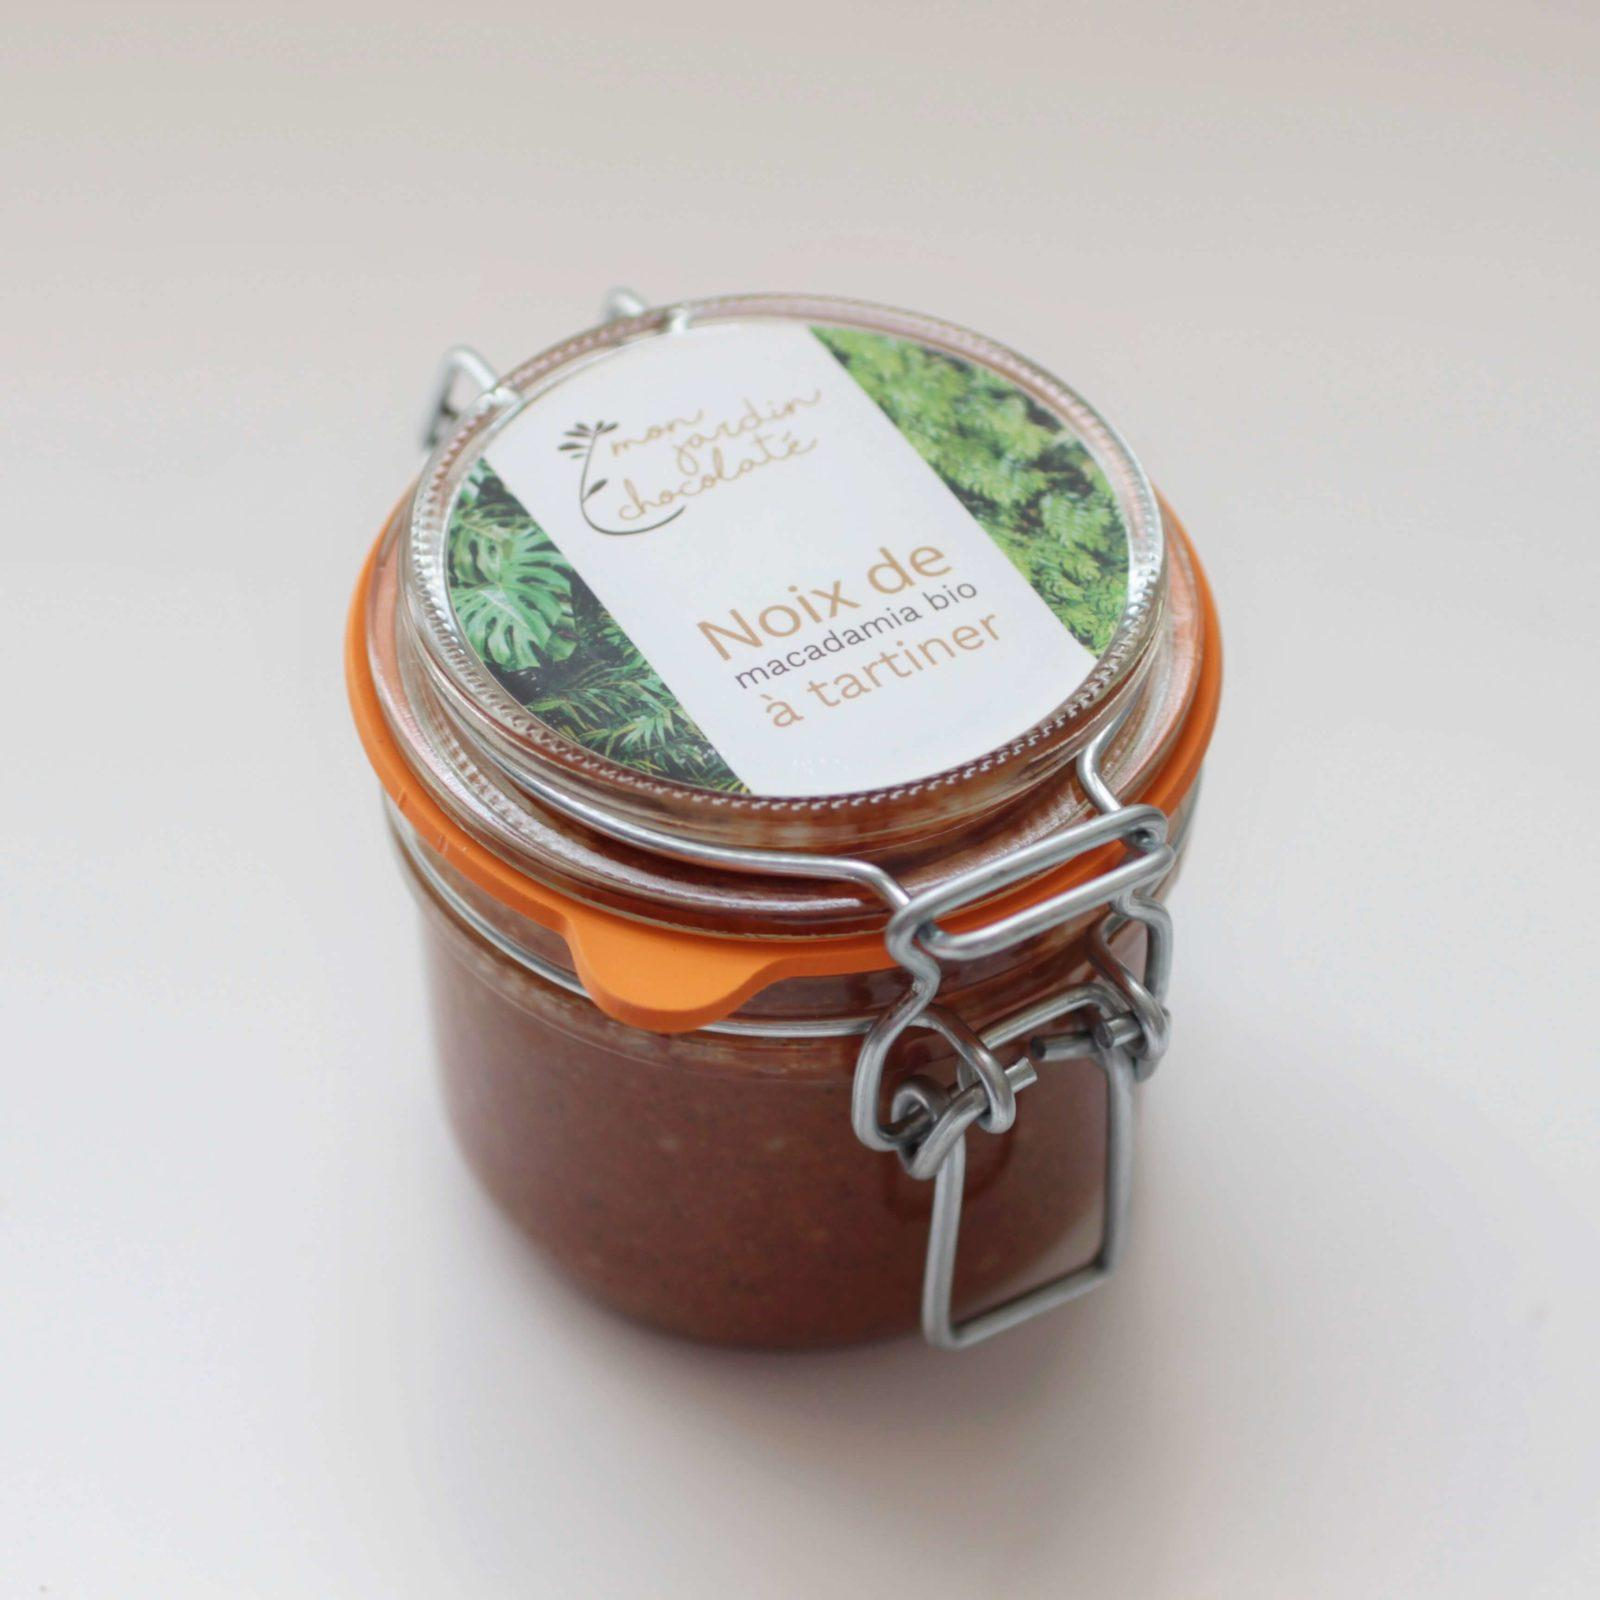 Pâte à tartiner à la noix de macadamia